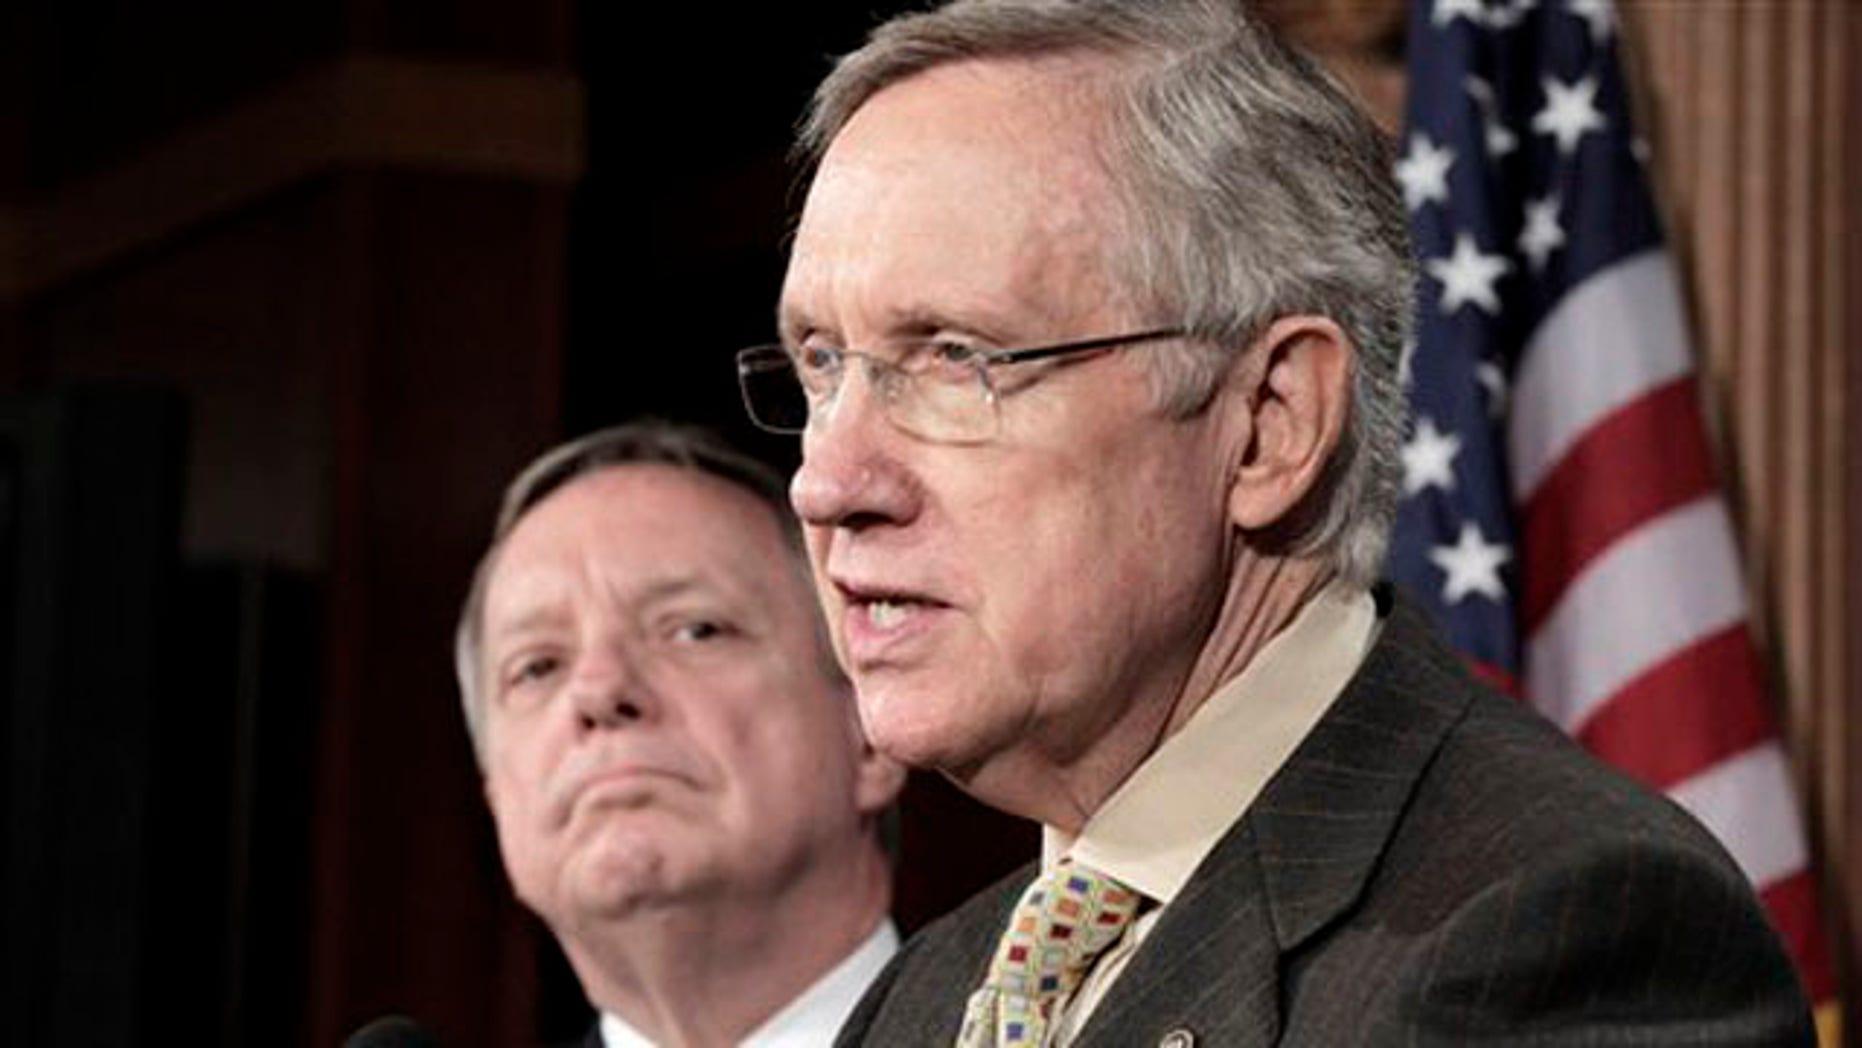 Senate Majority Leader Harry Reid, right, accompanied by Senate Majority Whip Richard Durbin, speaks to reporters on Capitol Hill June 30.